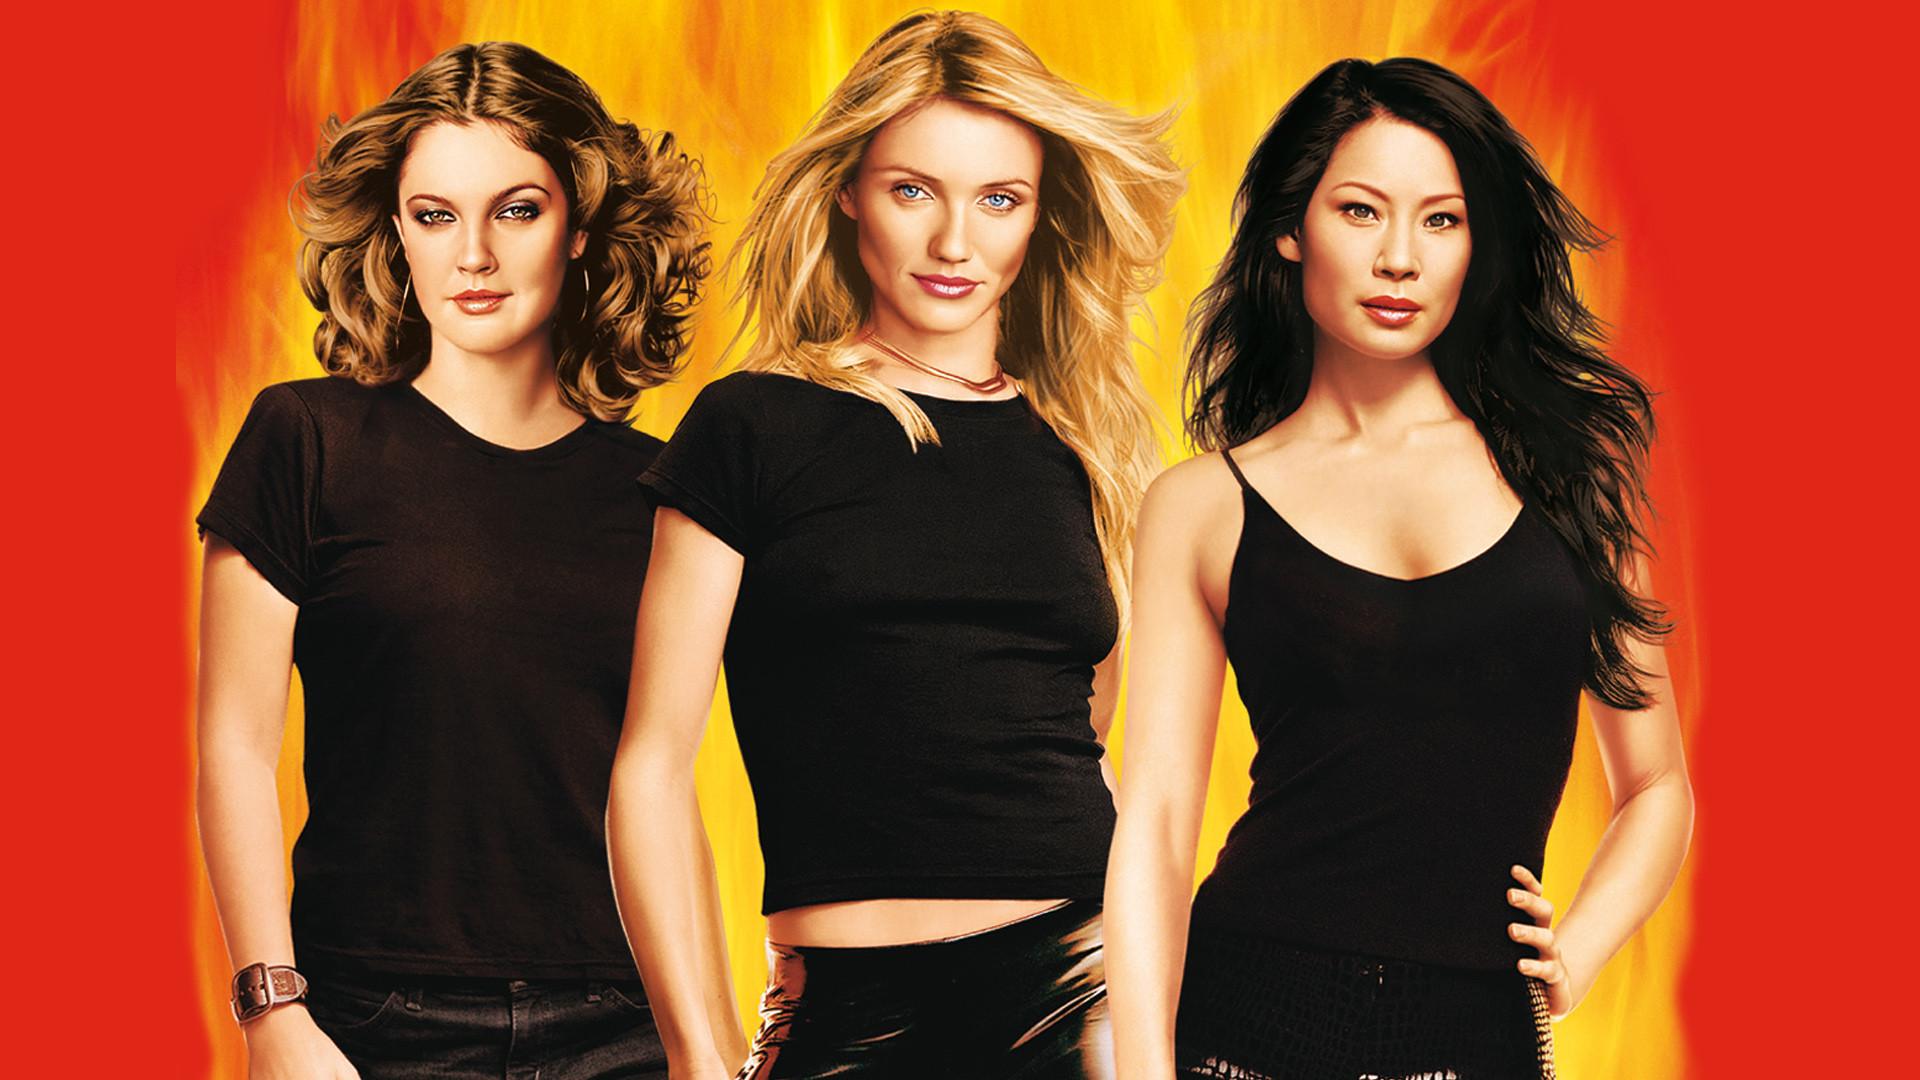 Soundtrack Angeles De Charlie 2000 Y 2003